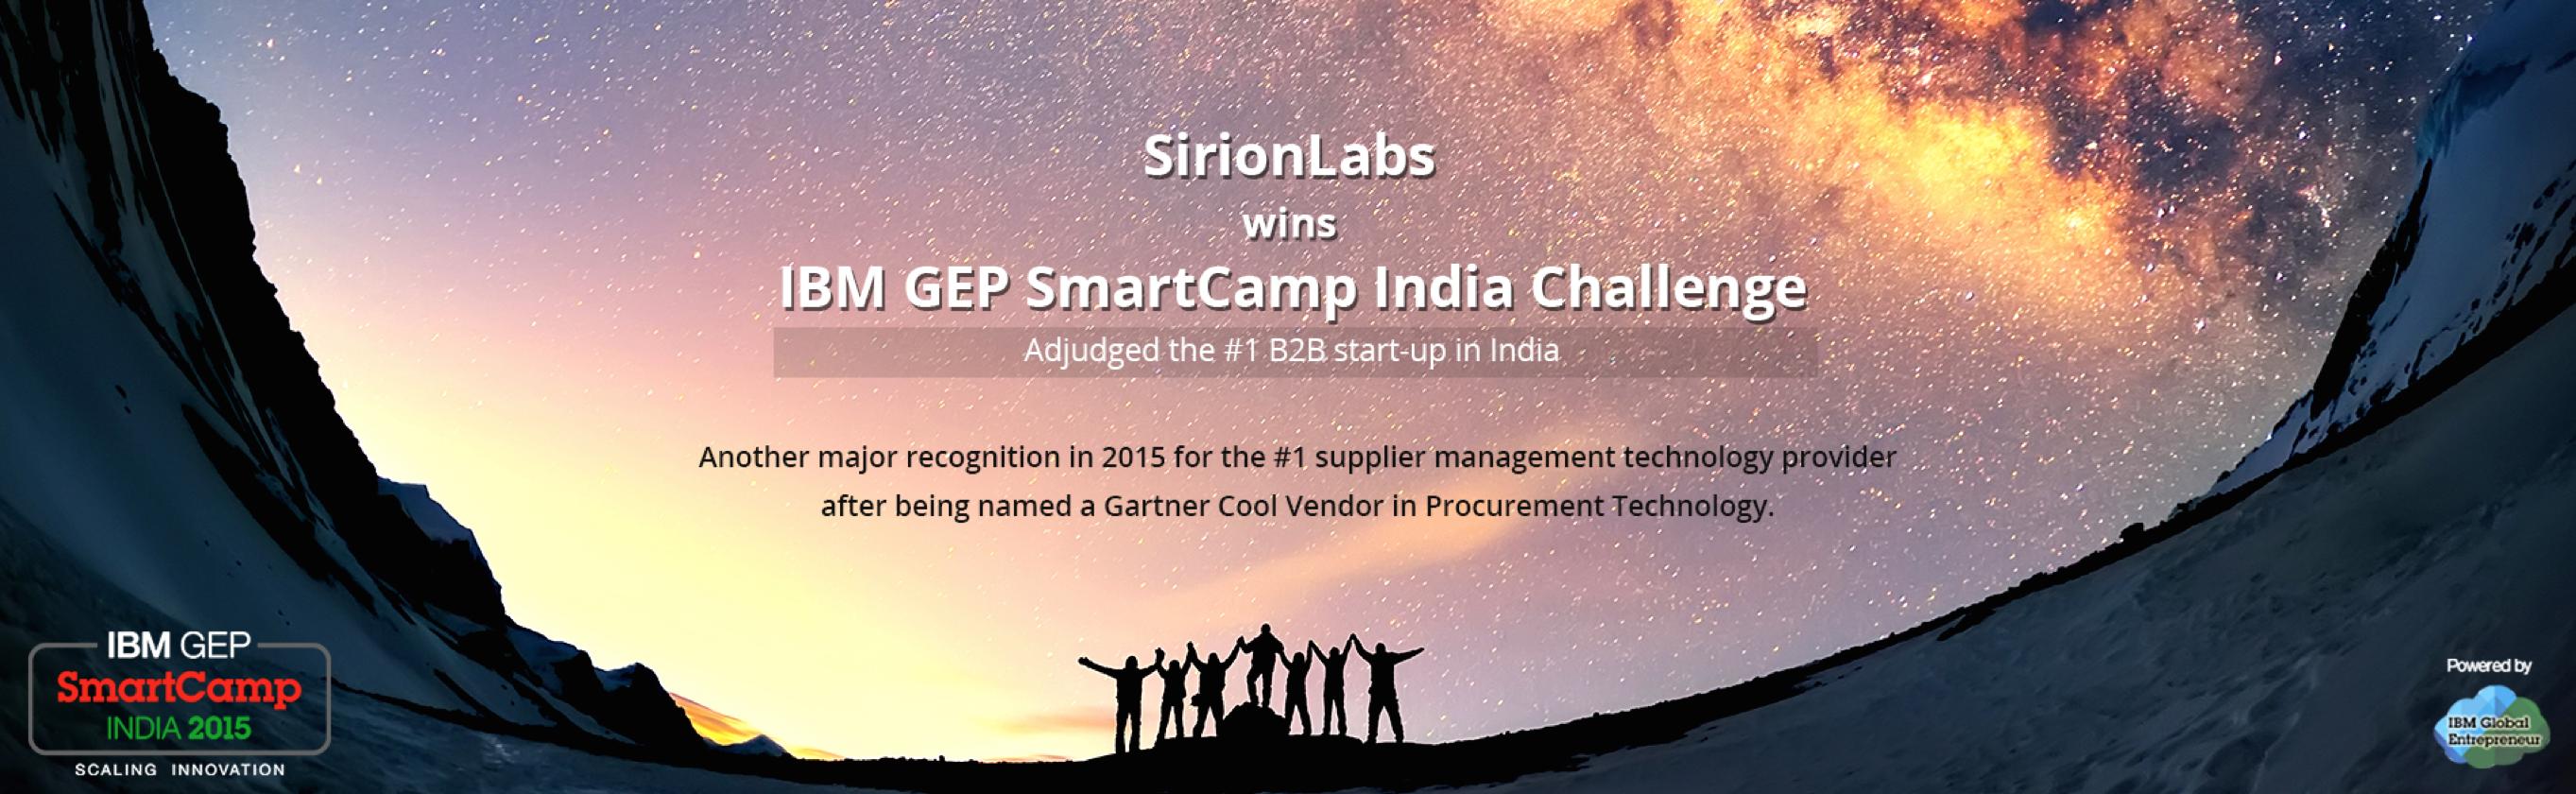 smartcamp winners